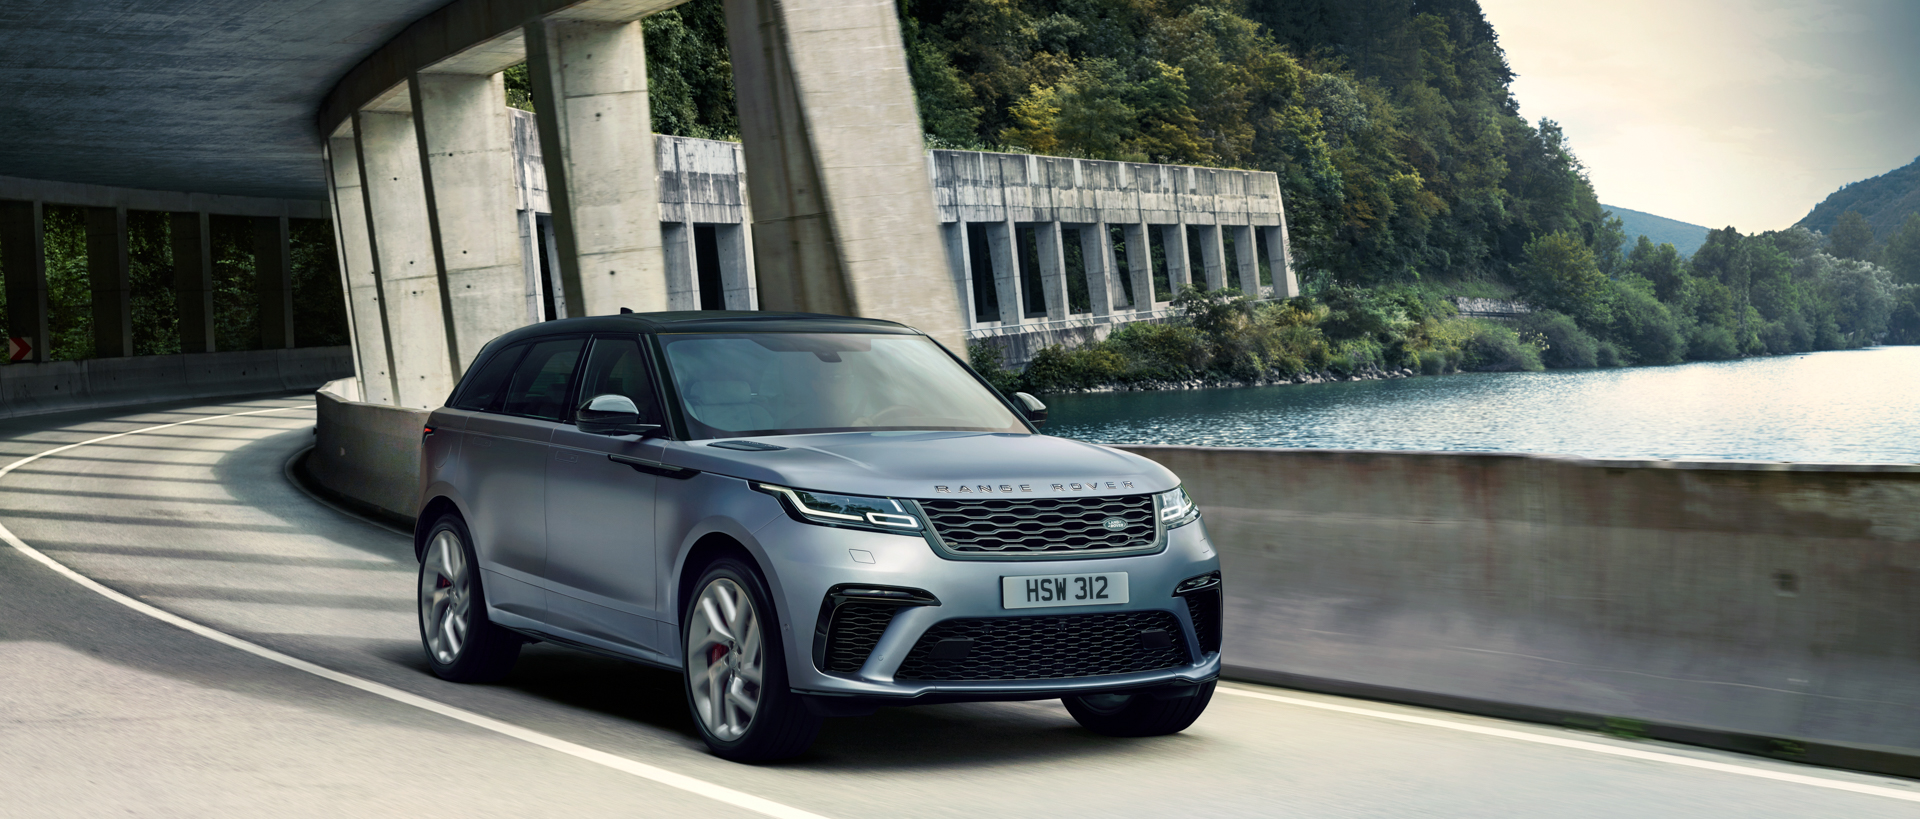 Range Rover Velar SVAutobiography 2 of 4